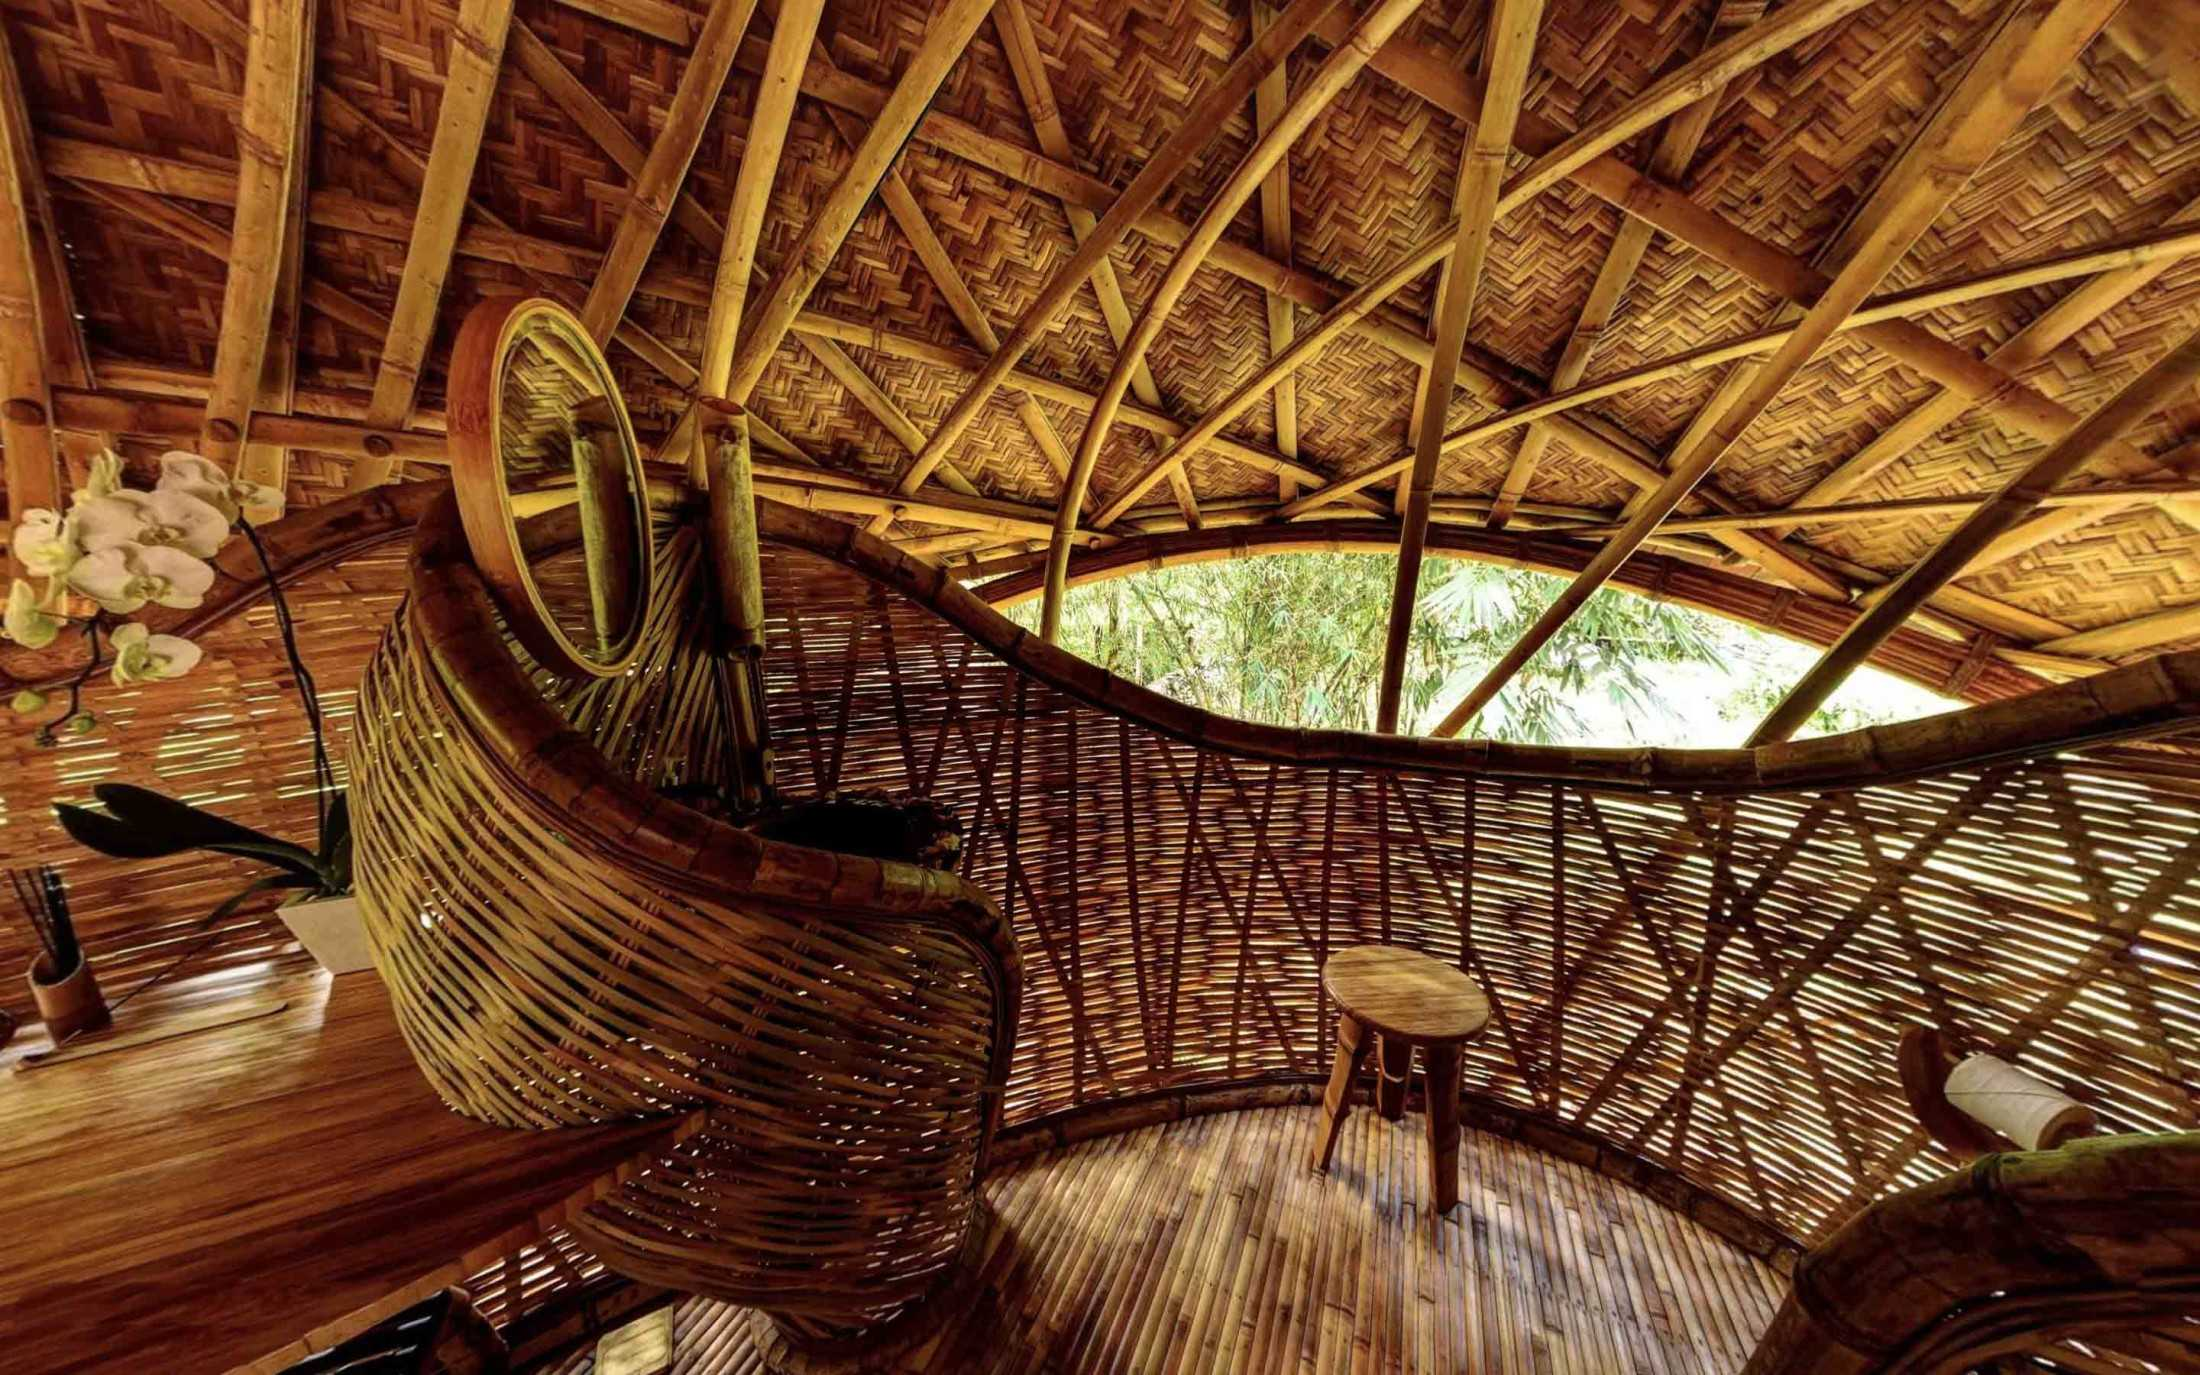 Agung Budi Raharsa | Architecture & Engineering Riverbend Bamboo House - Bali Bali, Indonesia Bali, Indonesia Agung-Budi-Raharsa-Riverbend-House-Bali  88725